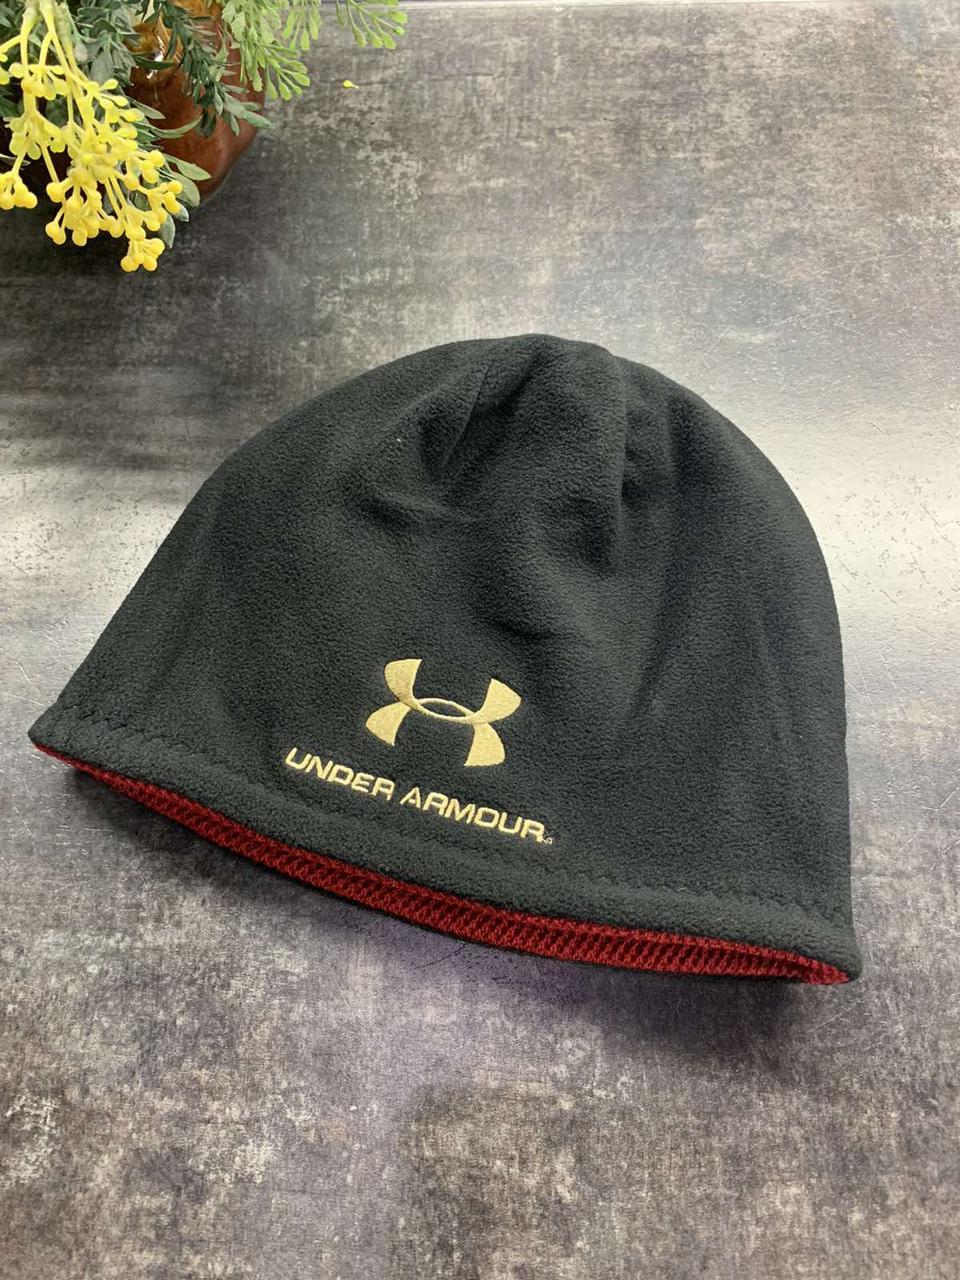 Зимняя двухсторонняя шапка Under Armor черная